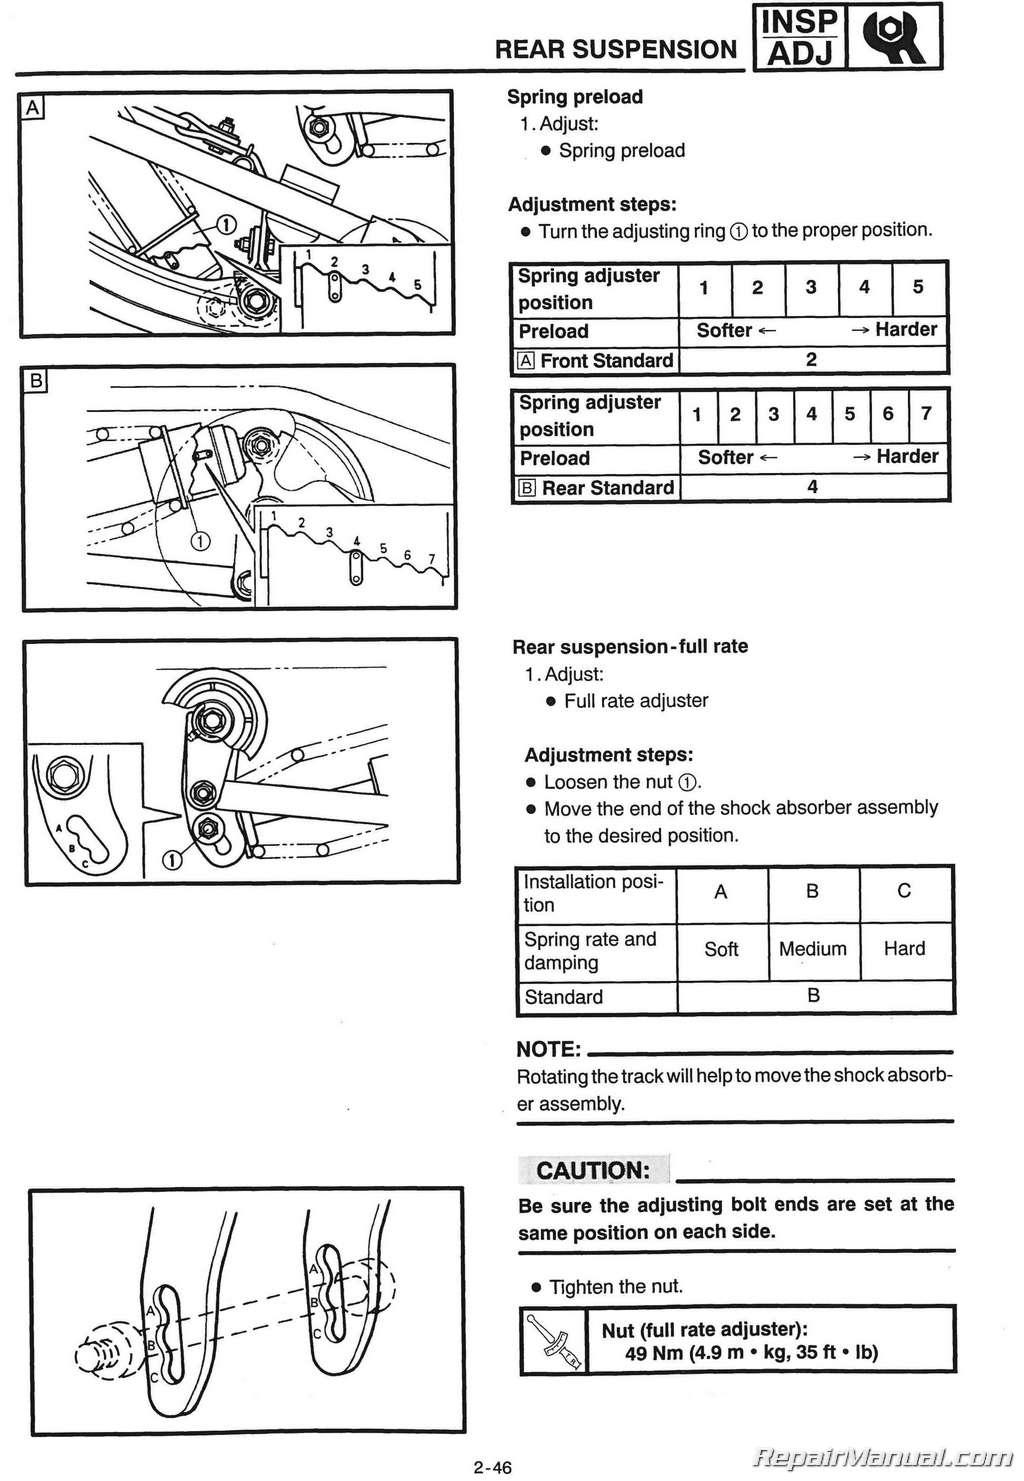 hight resolution of 1997 yamaha snowmobile wiring diagram trusted wiring diagram vmax 540 snowmobile wiring diagram yamaha vmax